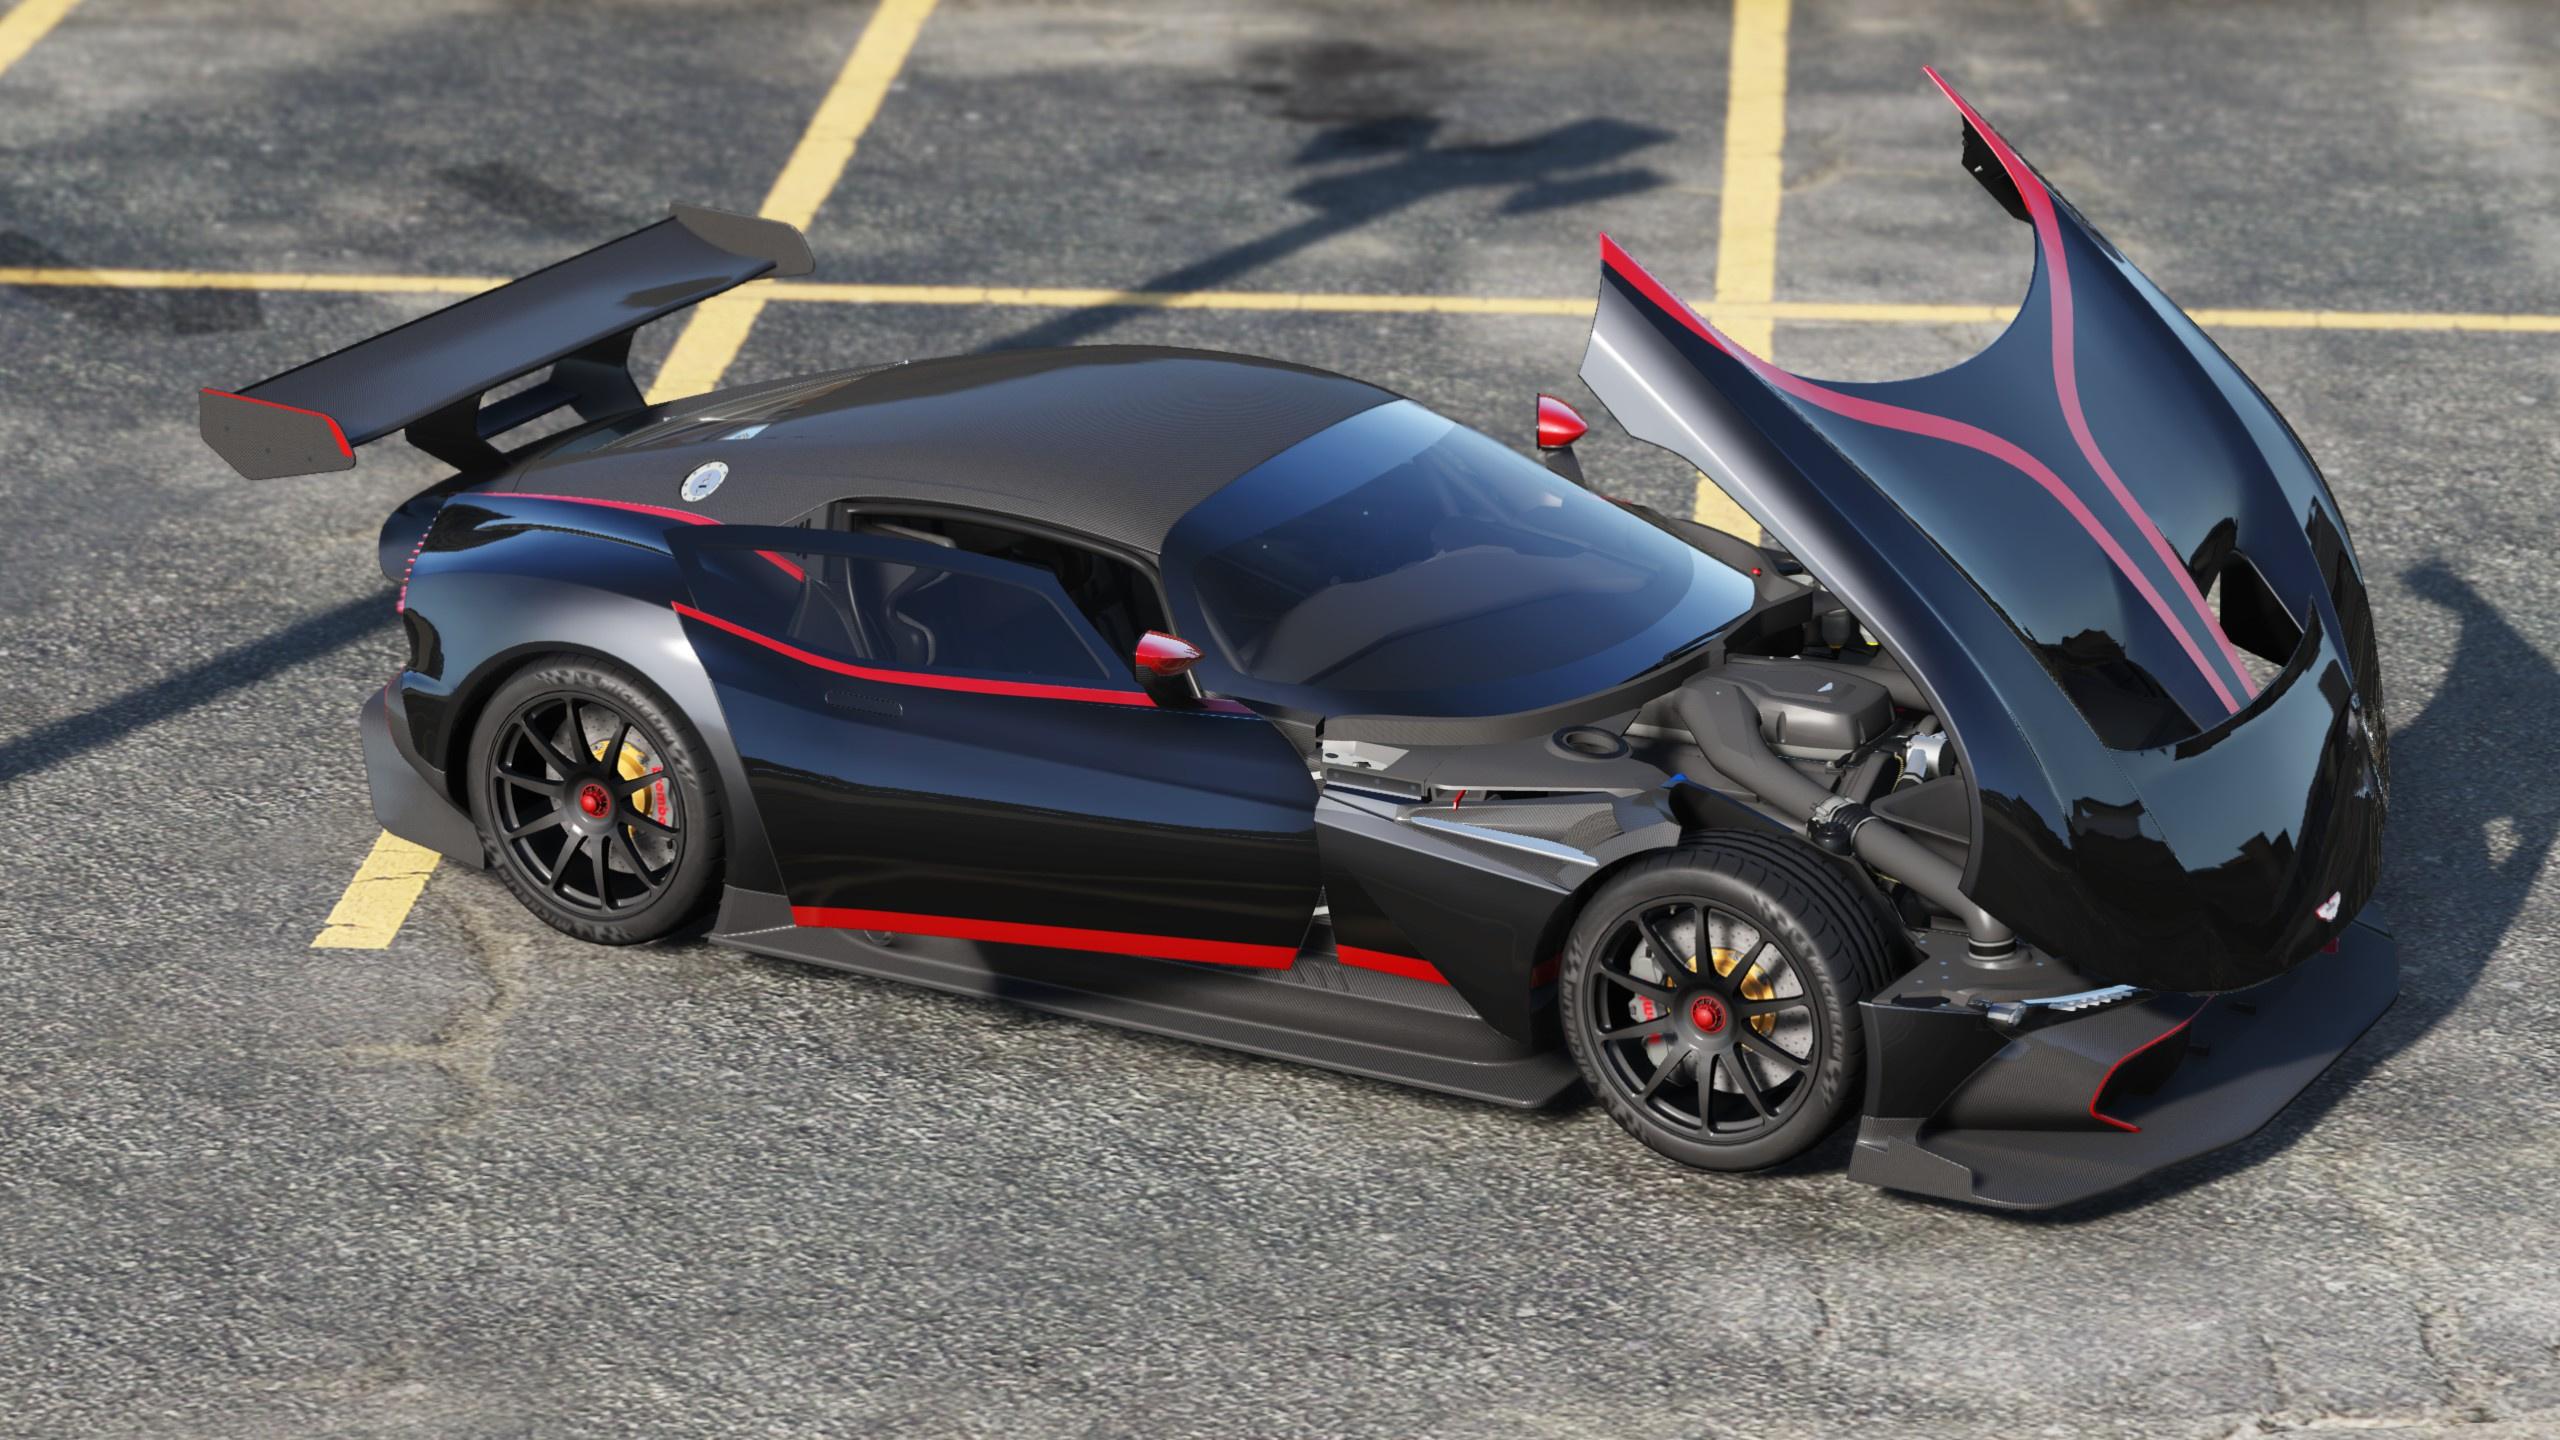 2016 Aston Martin Vulcan [Add-On